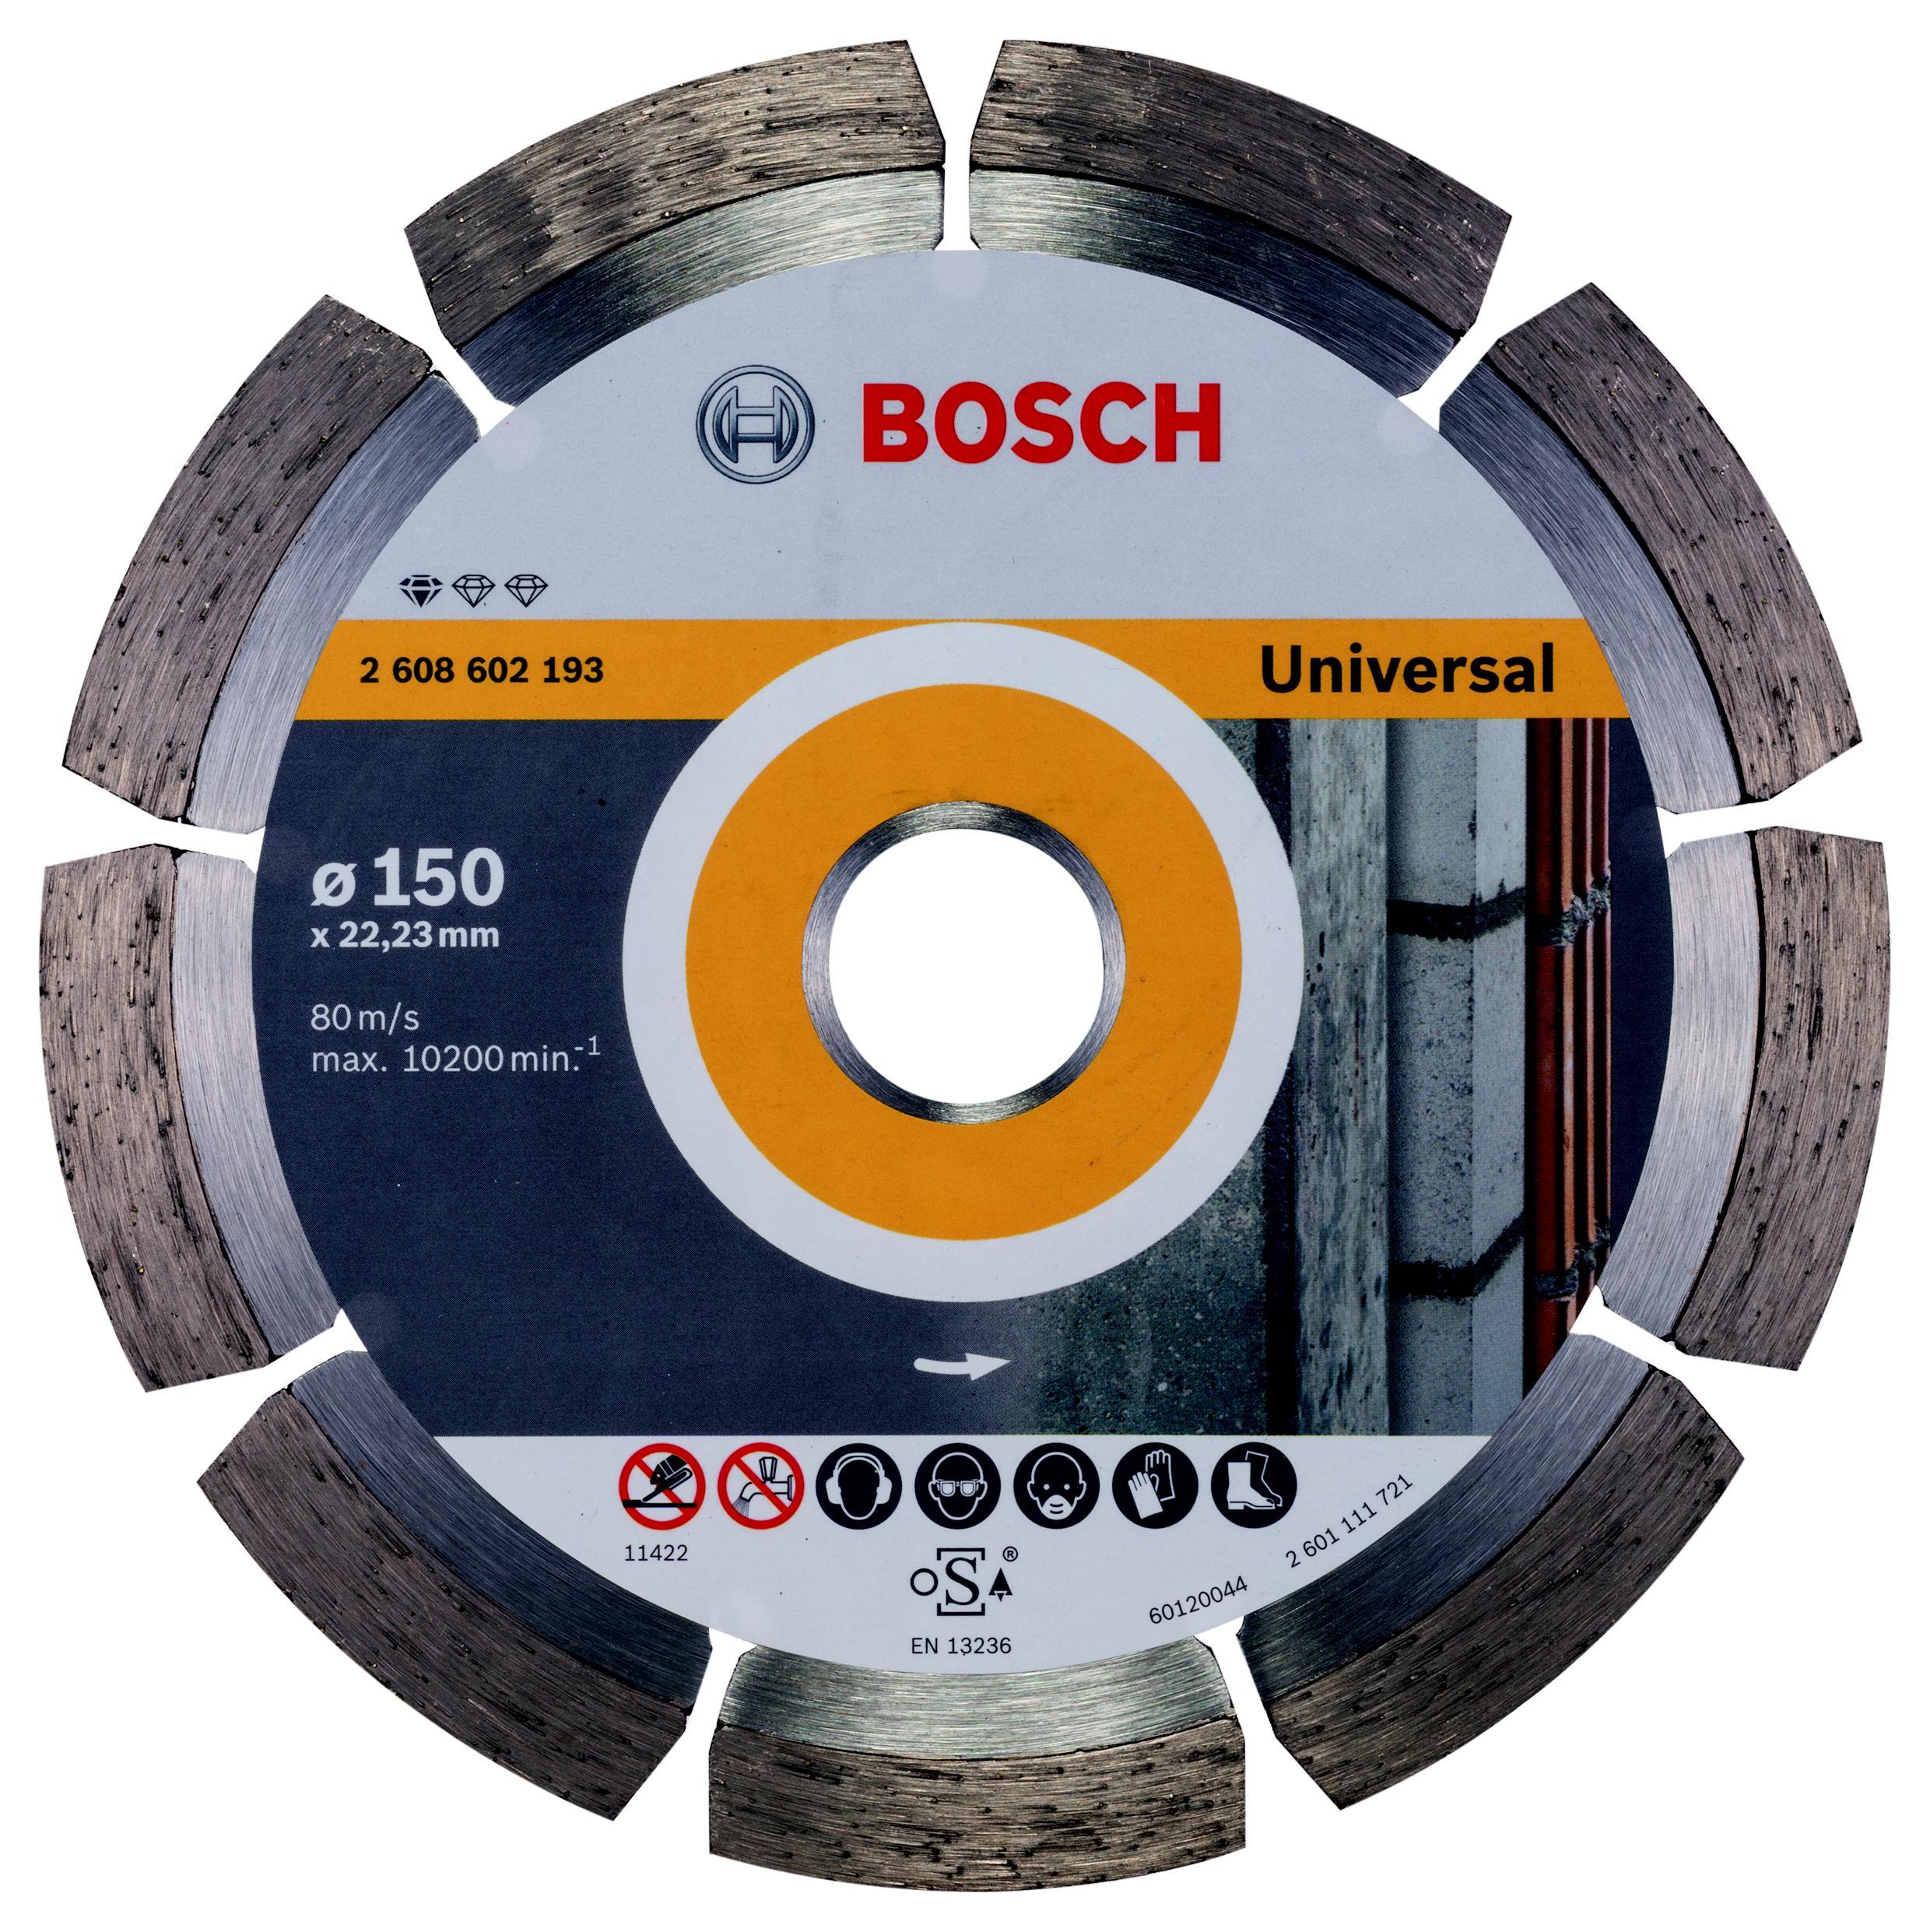 Круг алмазный Bosch Standard for universal 150x22 сегмент (2.608.602.193) 1000pcs universal viton oring seals gb3 100 asnu08c for universal bosch fuel injection injector ay o2012